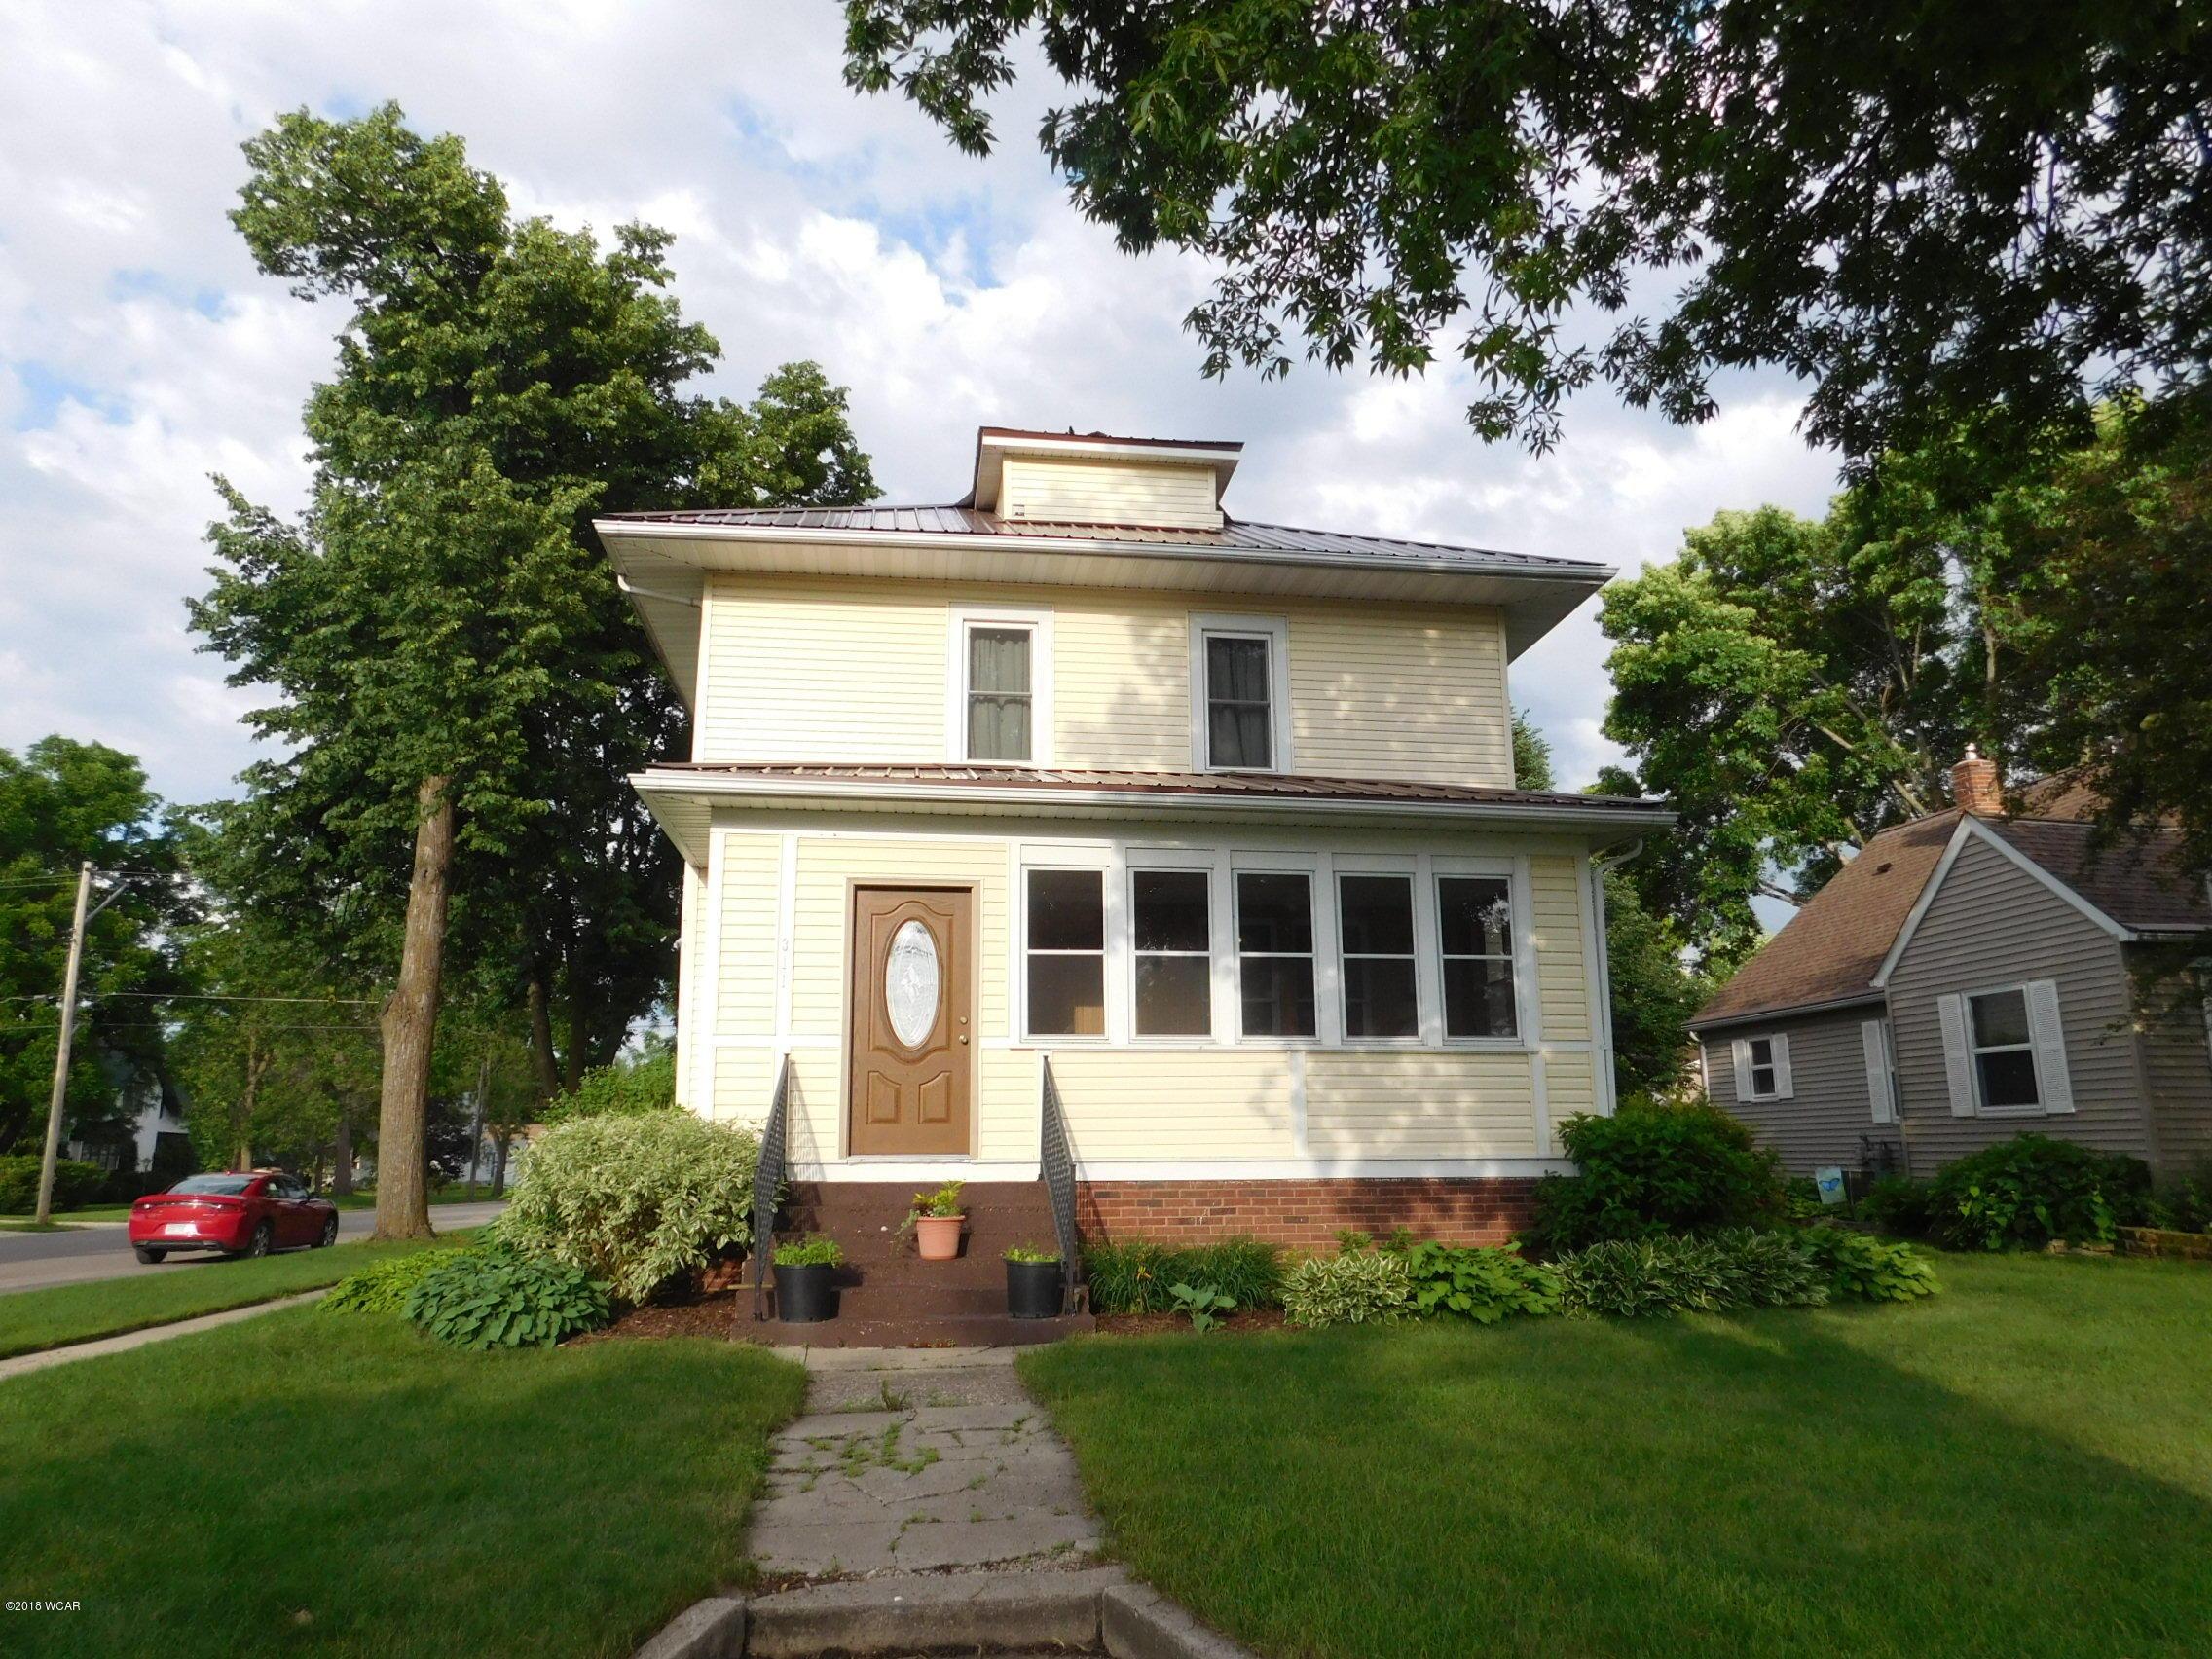 311 S 6th Street,Bird Island,3 Bedrooms Bedrooms,2 BathroomsBathrooms,Single Family,S 6th Street,6031044